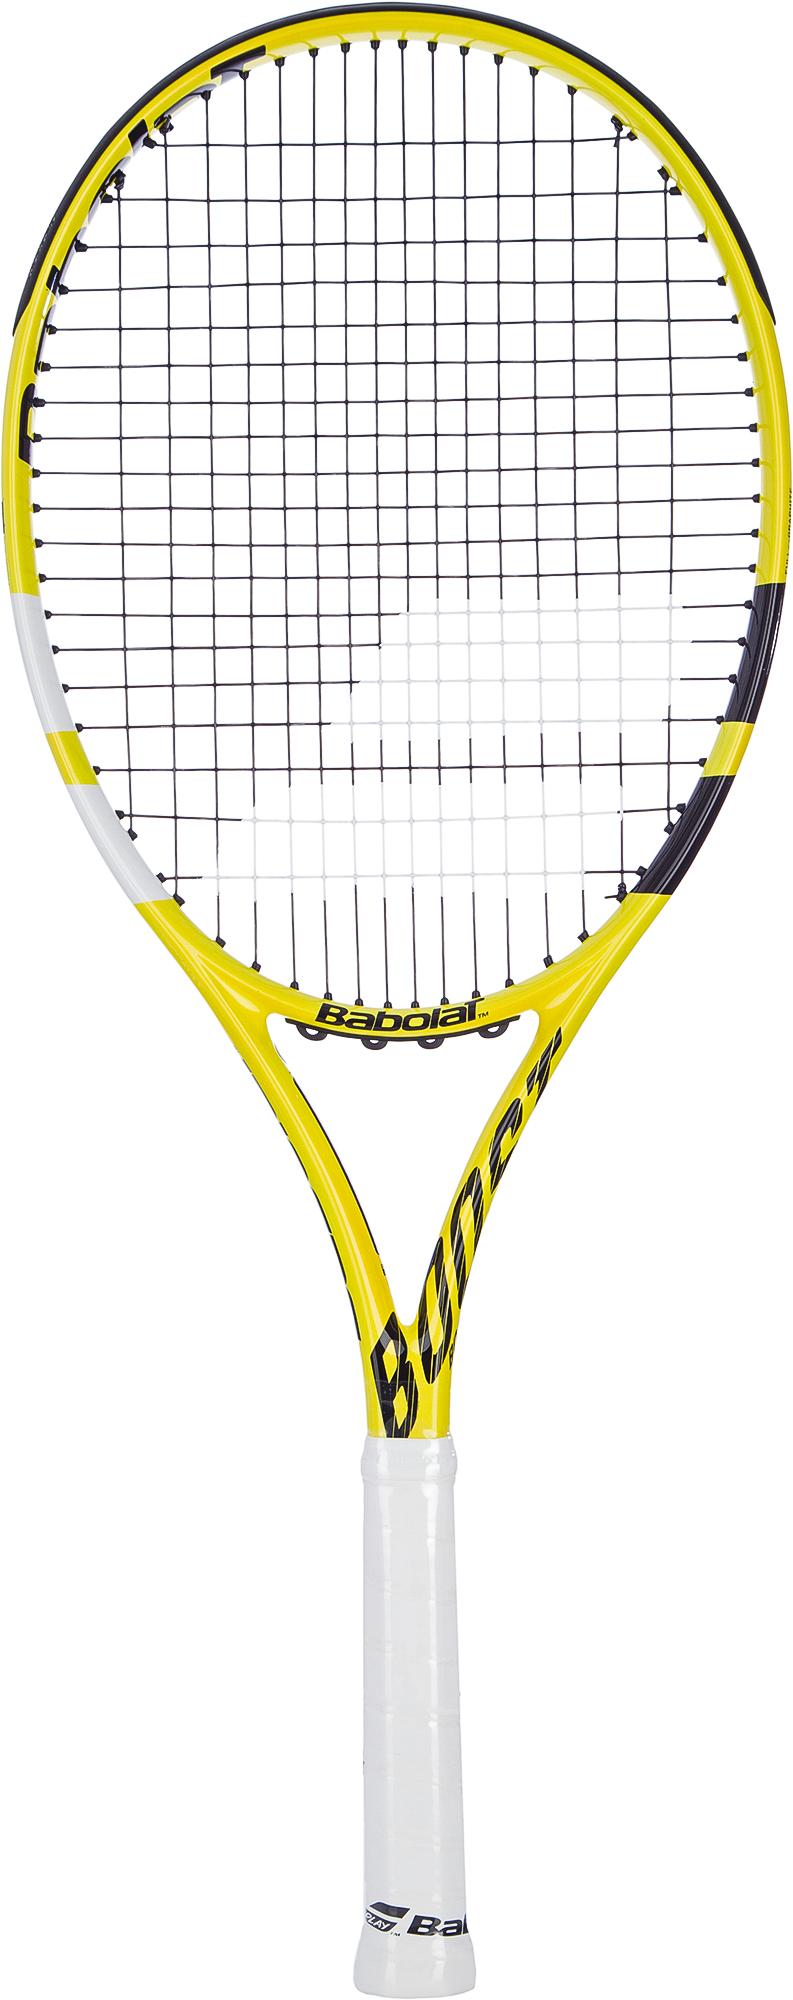 Babolat Ракетка для большого тенниса Babolat Boost Aero babolat ракетка для большого тенниса детская babolat aero junior 25 размер без размера